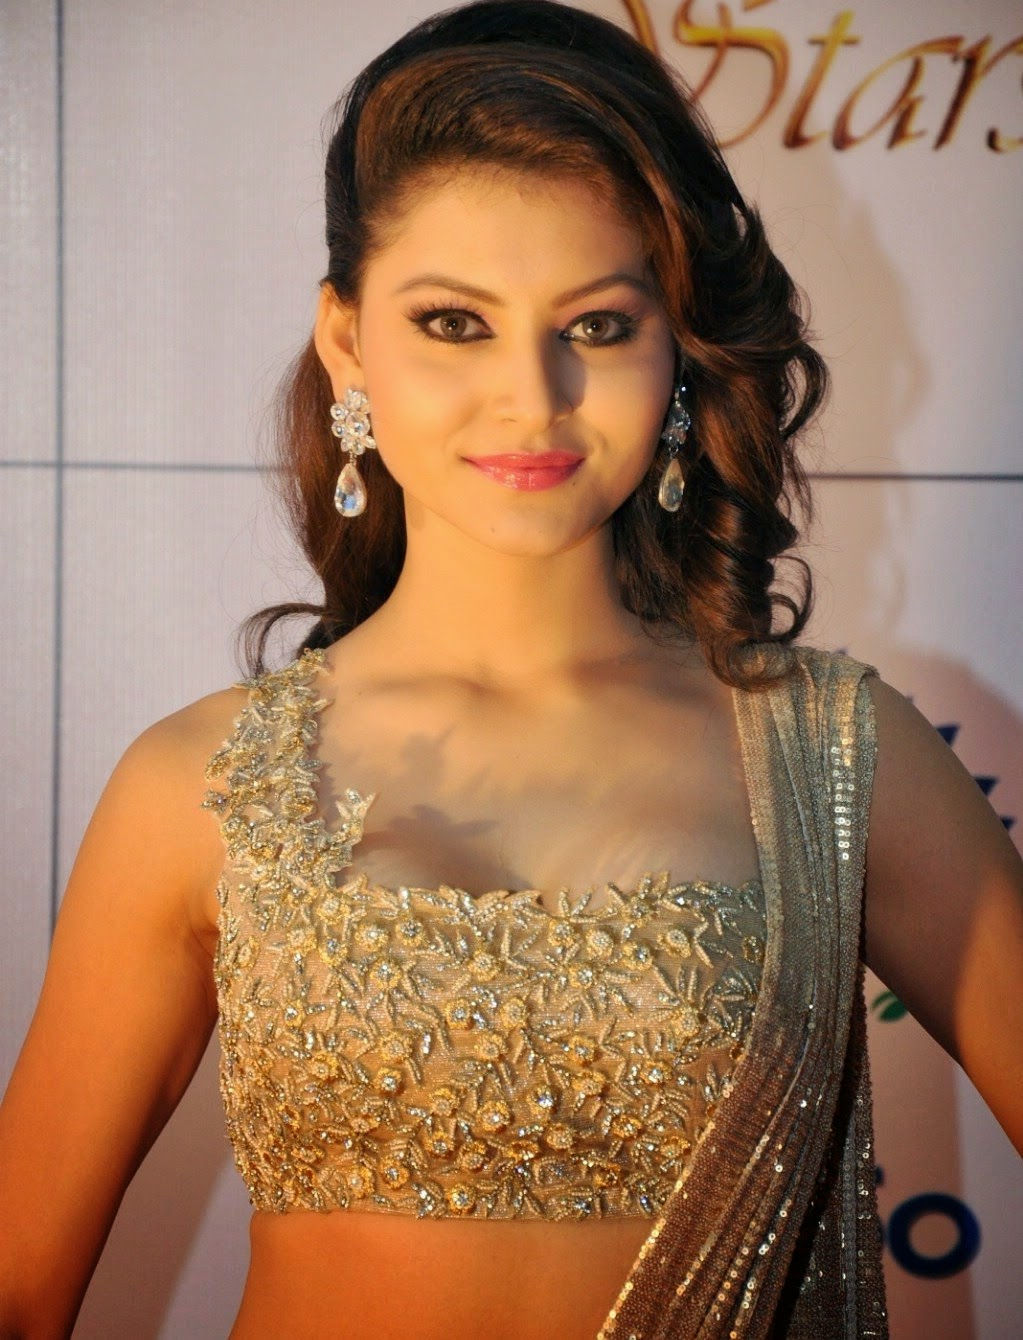 Urvashi Rautela, Samantha Hot In Designer Dress  Cute -1172